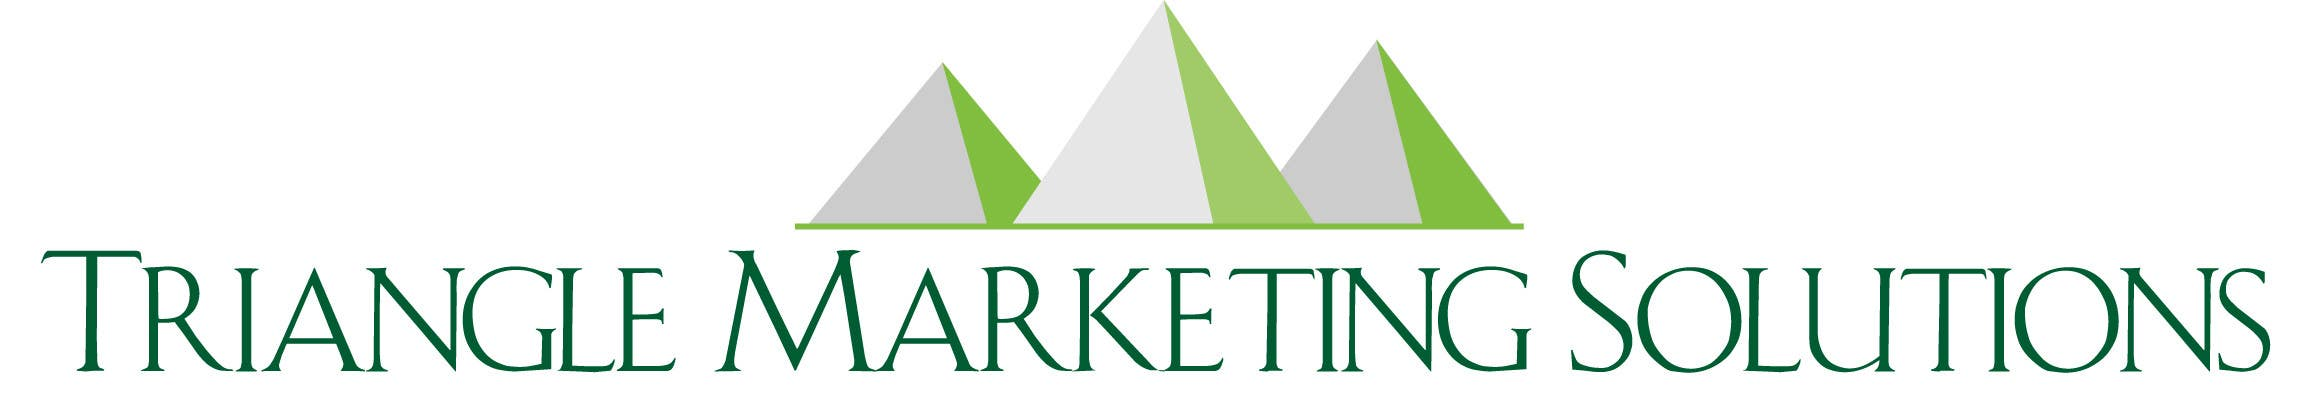 Penyertaan Peraduan #1 untuk Design a Logo for Traingle Marketing Solutions